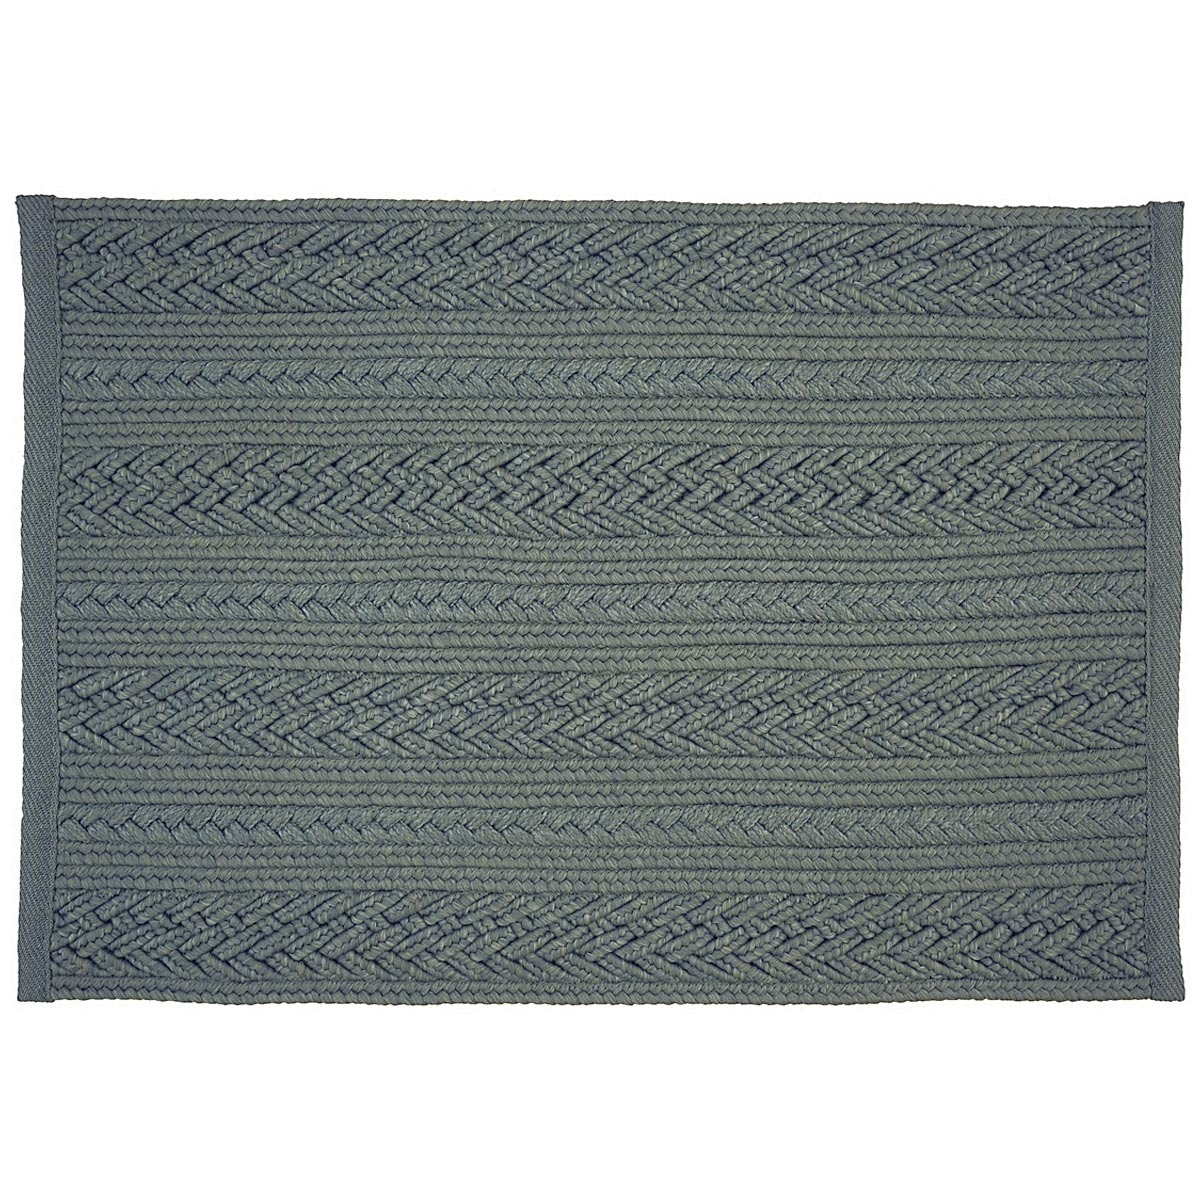 laguna indoor outdoor rectangle braided rug country primitive homespice decor ebay